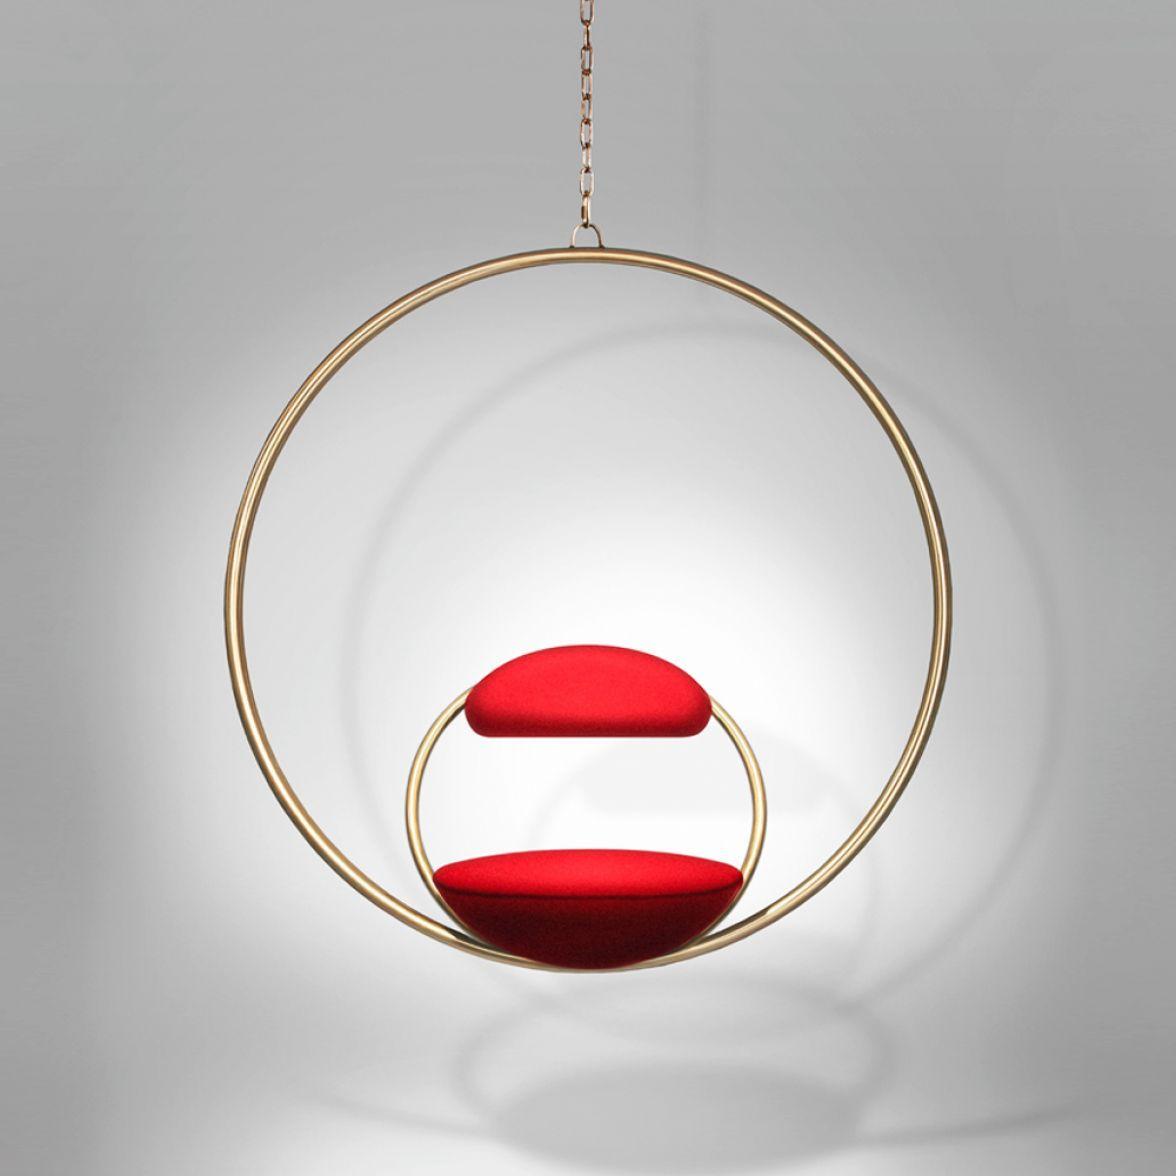 Подвесное кресло Hoop фото цена